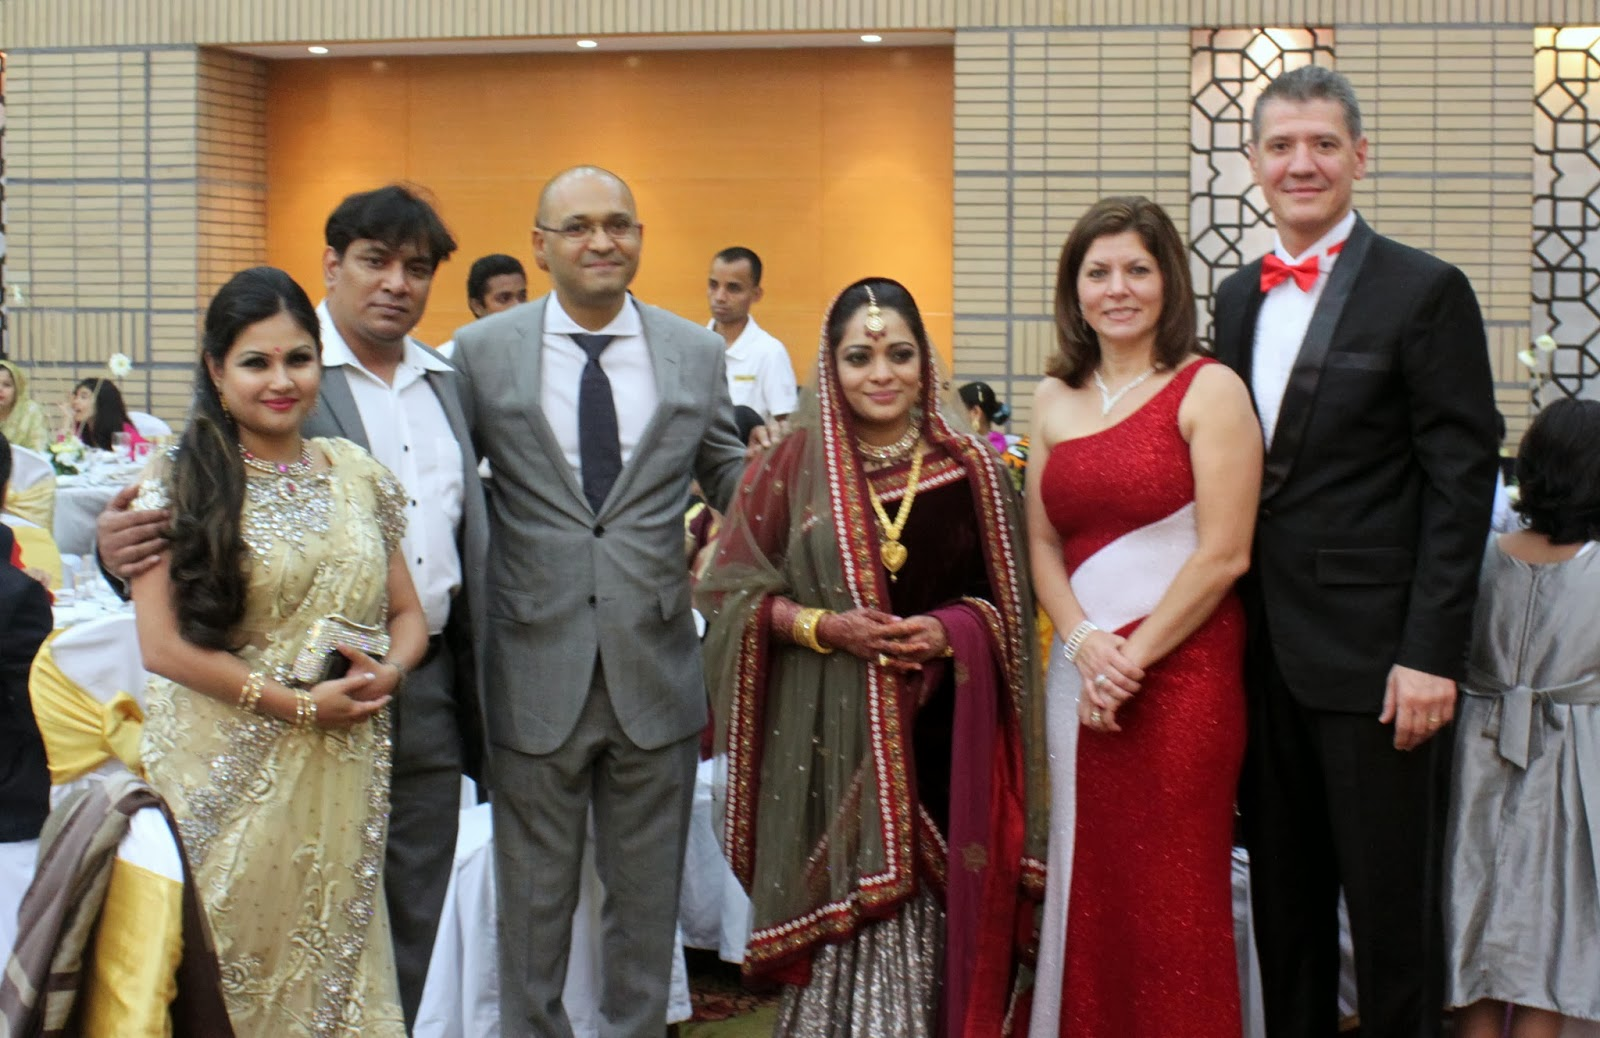 The Americans WILL Come: A Bangladeshi Wedding Reception